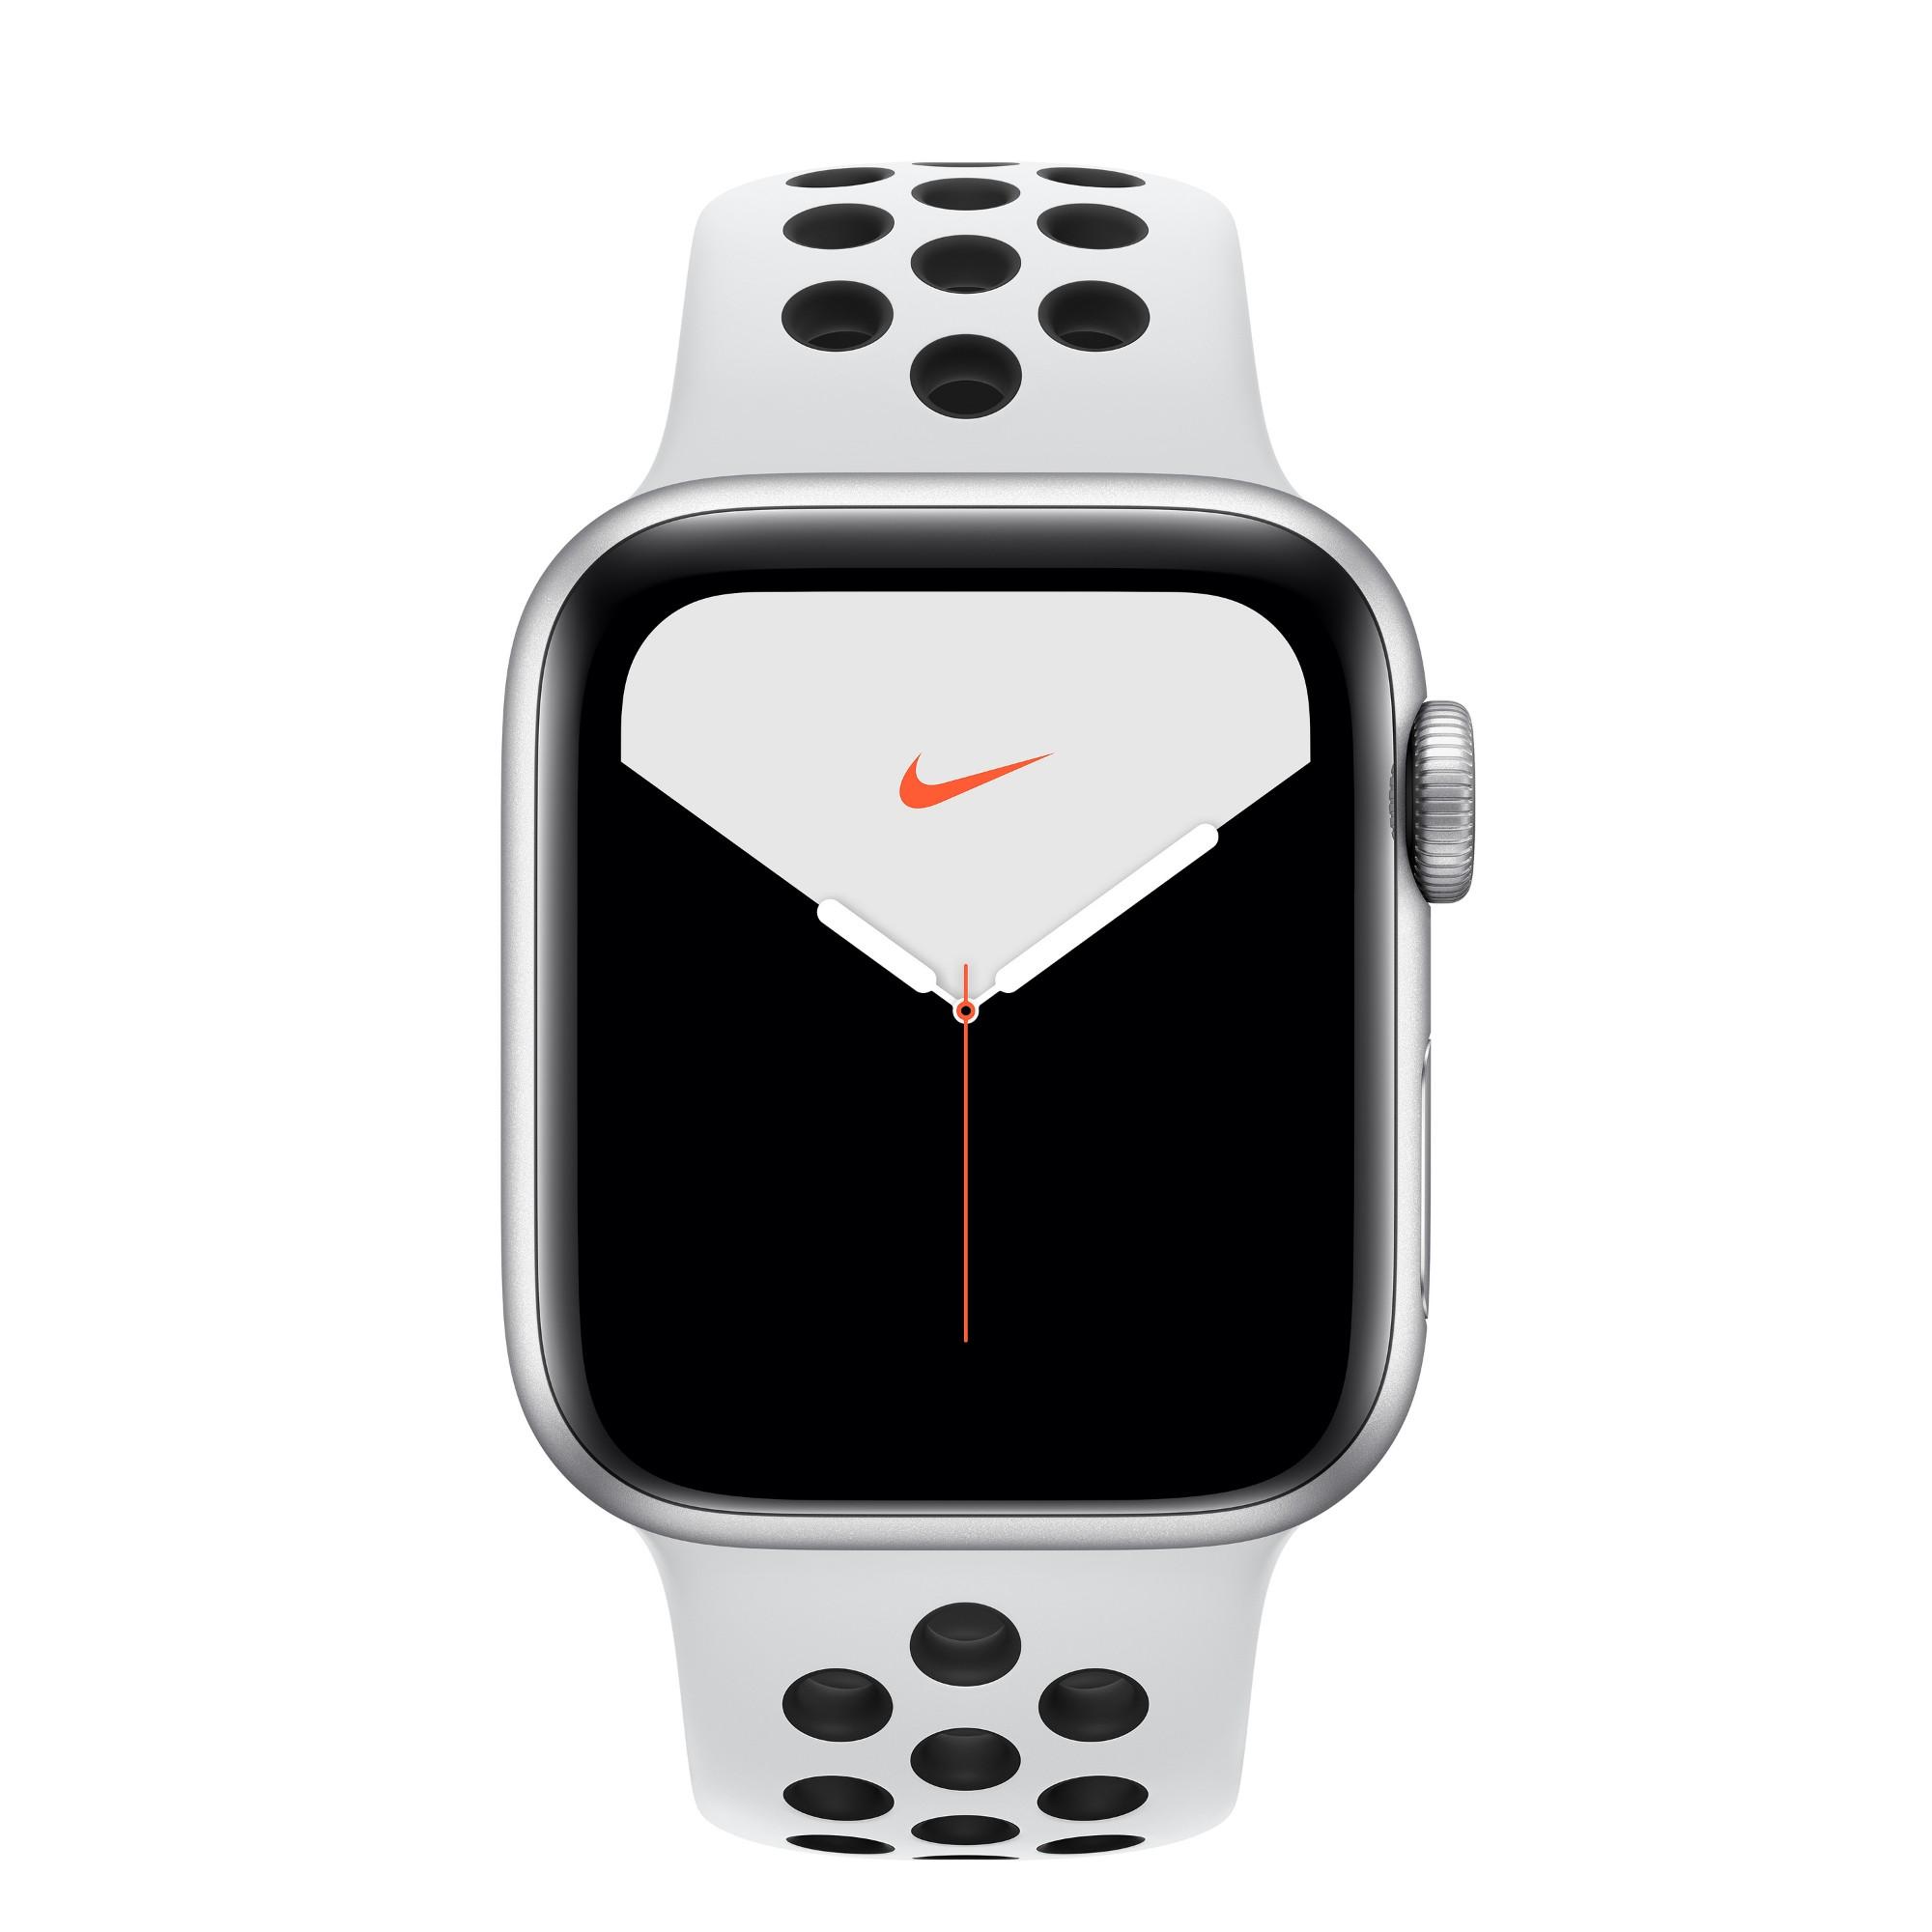 Apple Watch Nike Series 5 smartwatch Silver OLED GPS satellite